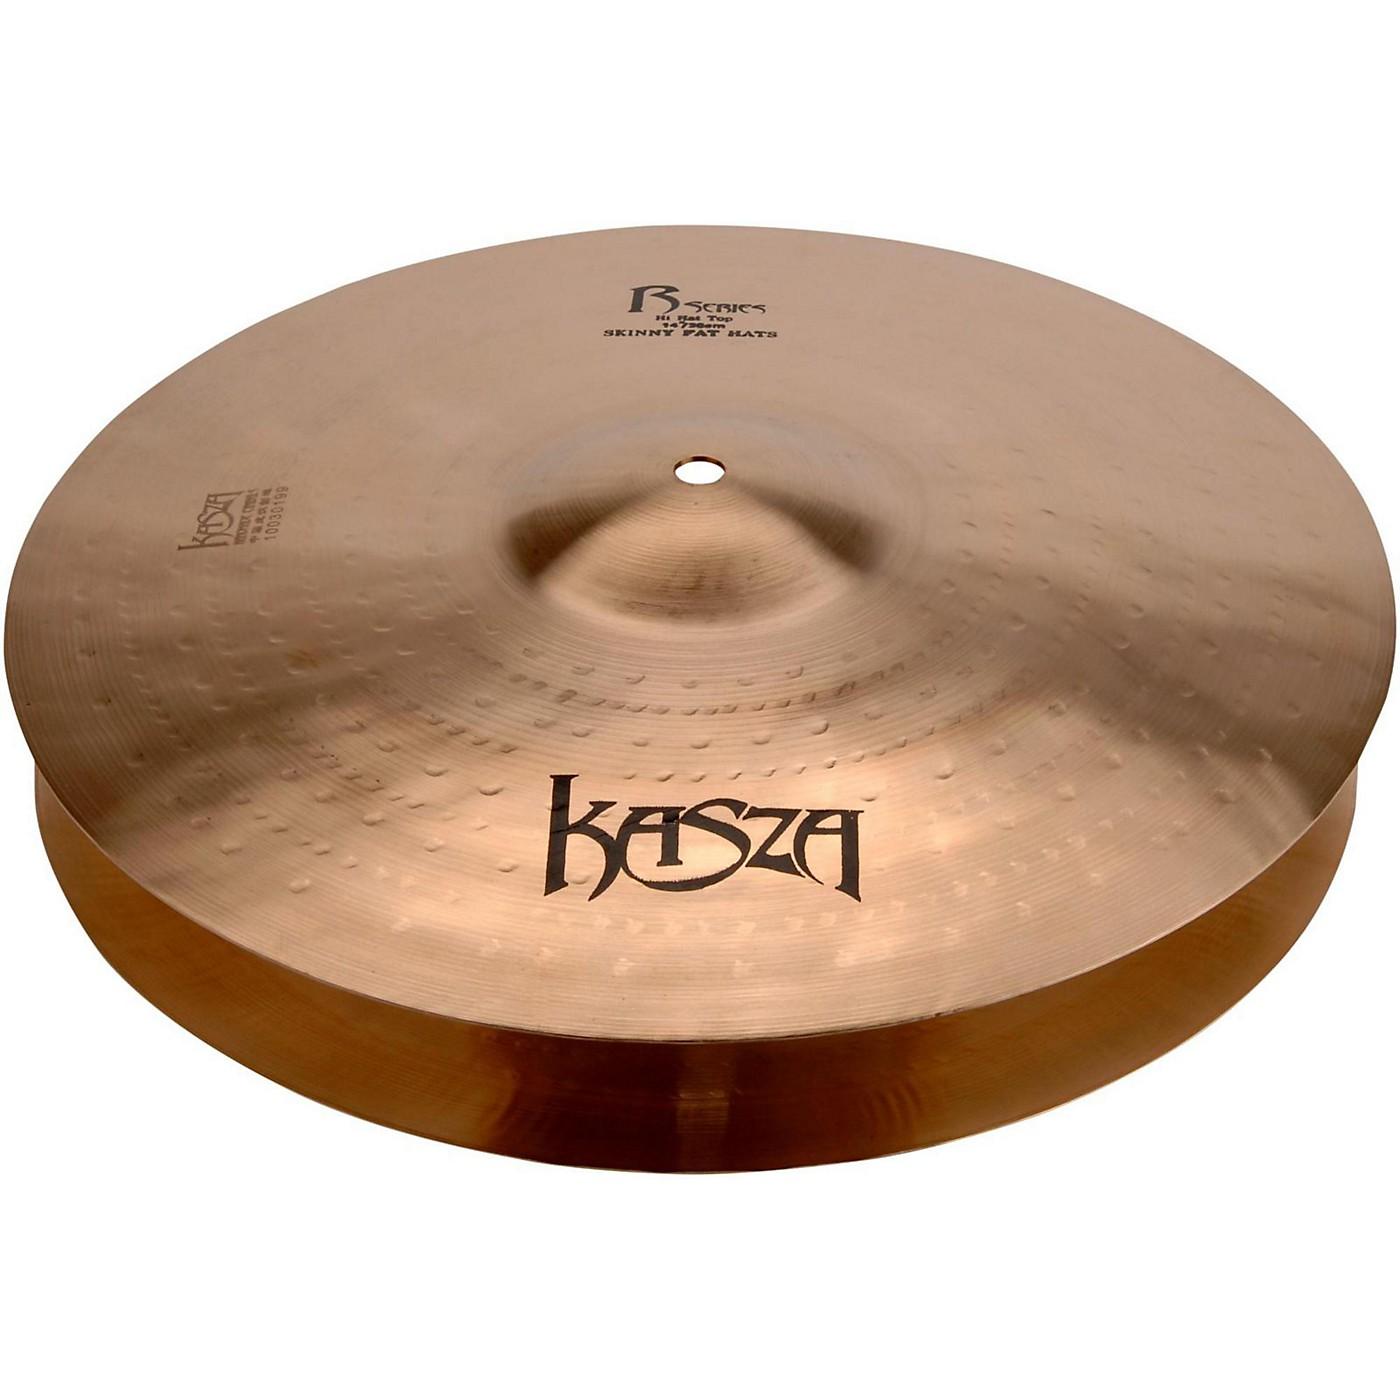 Kasza Cymbals Light Top/Heavy Flat Bottom Skinny Fat Rock Hi-hats thumbnail